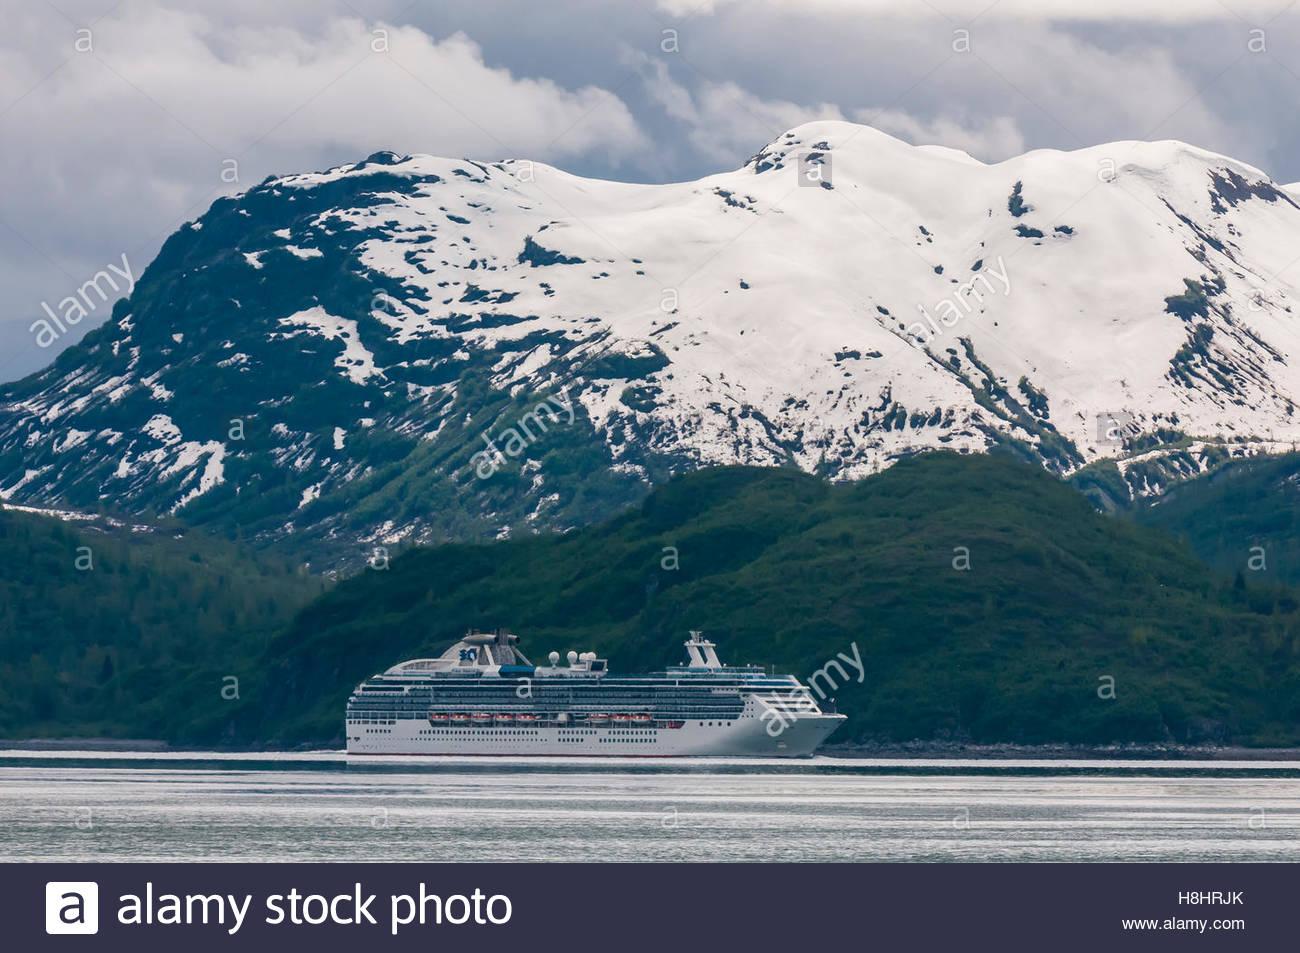 Coral Princess cruise ship sailing through Glacier Bay National Park (a UNESCO World Heritage Site), Alaska USA. - Stock Image